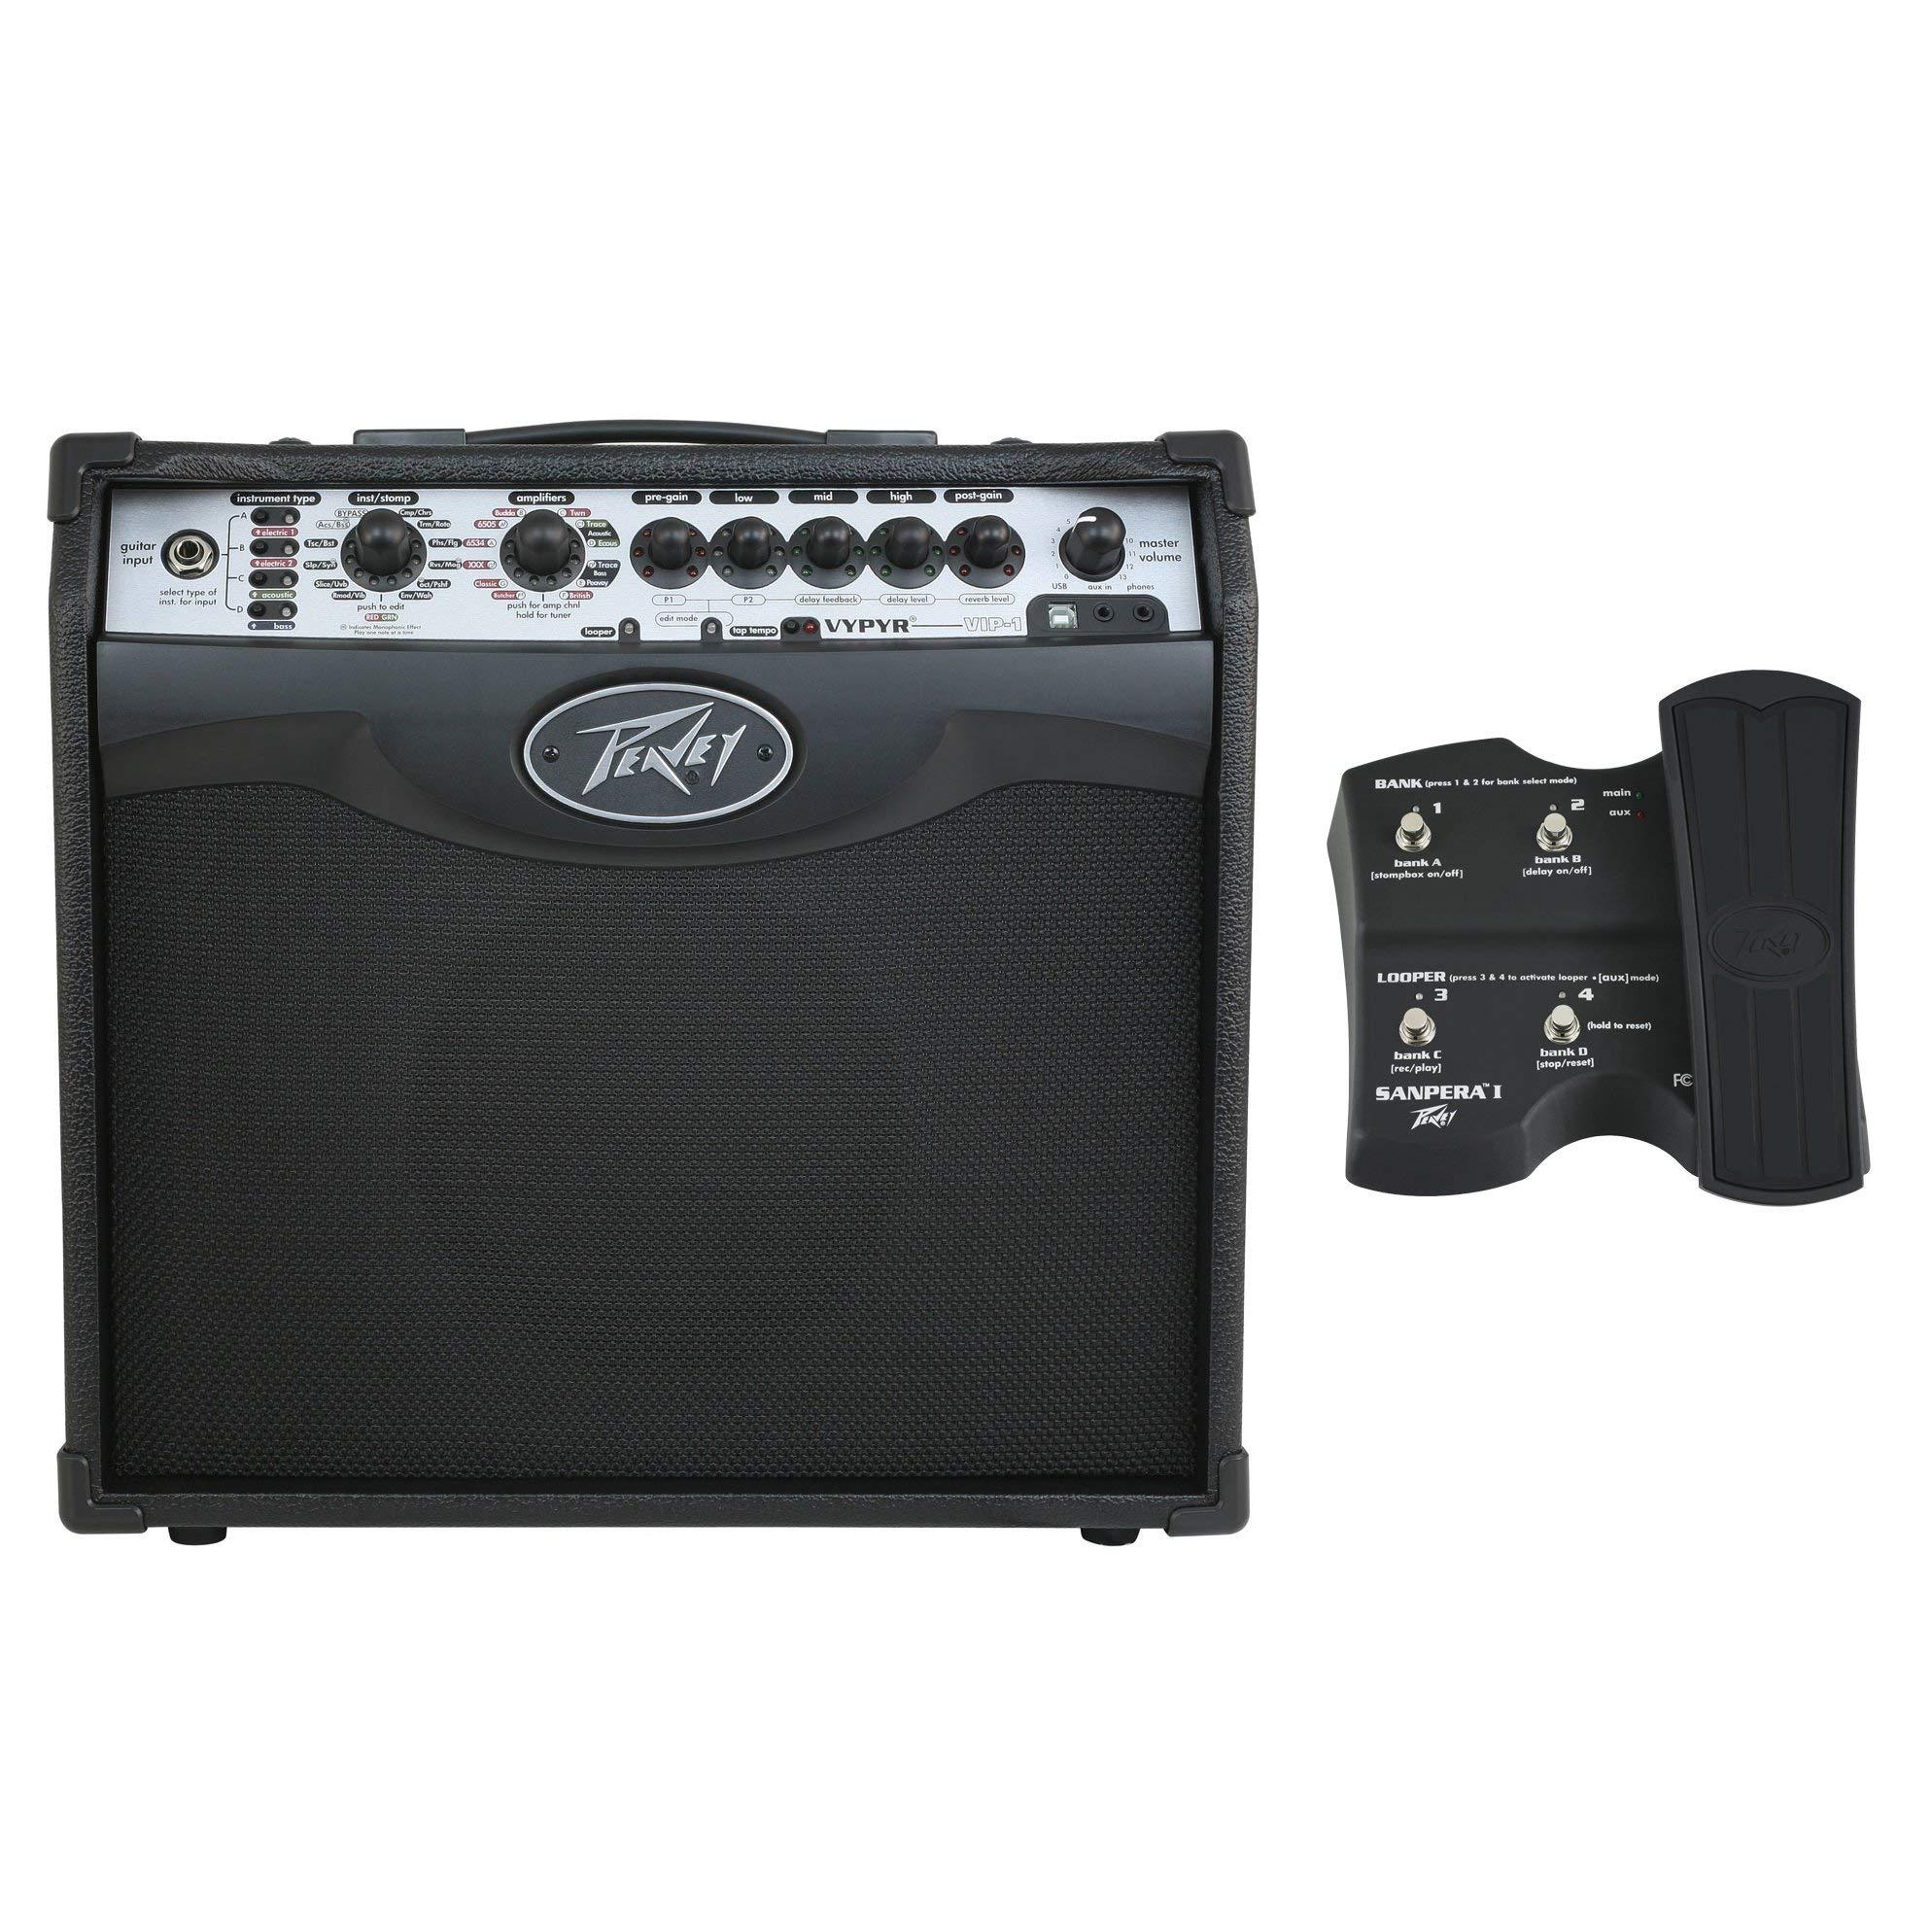 Peavey Vypyr VIP 1 20 Watt Combo Modeling Amplifier Amp + Sanpera I Pedal Controller